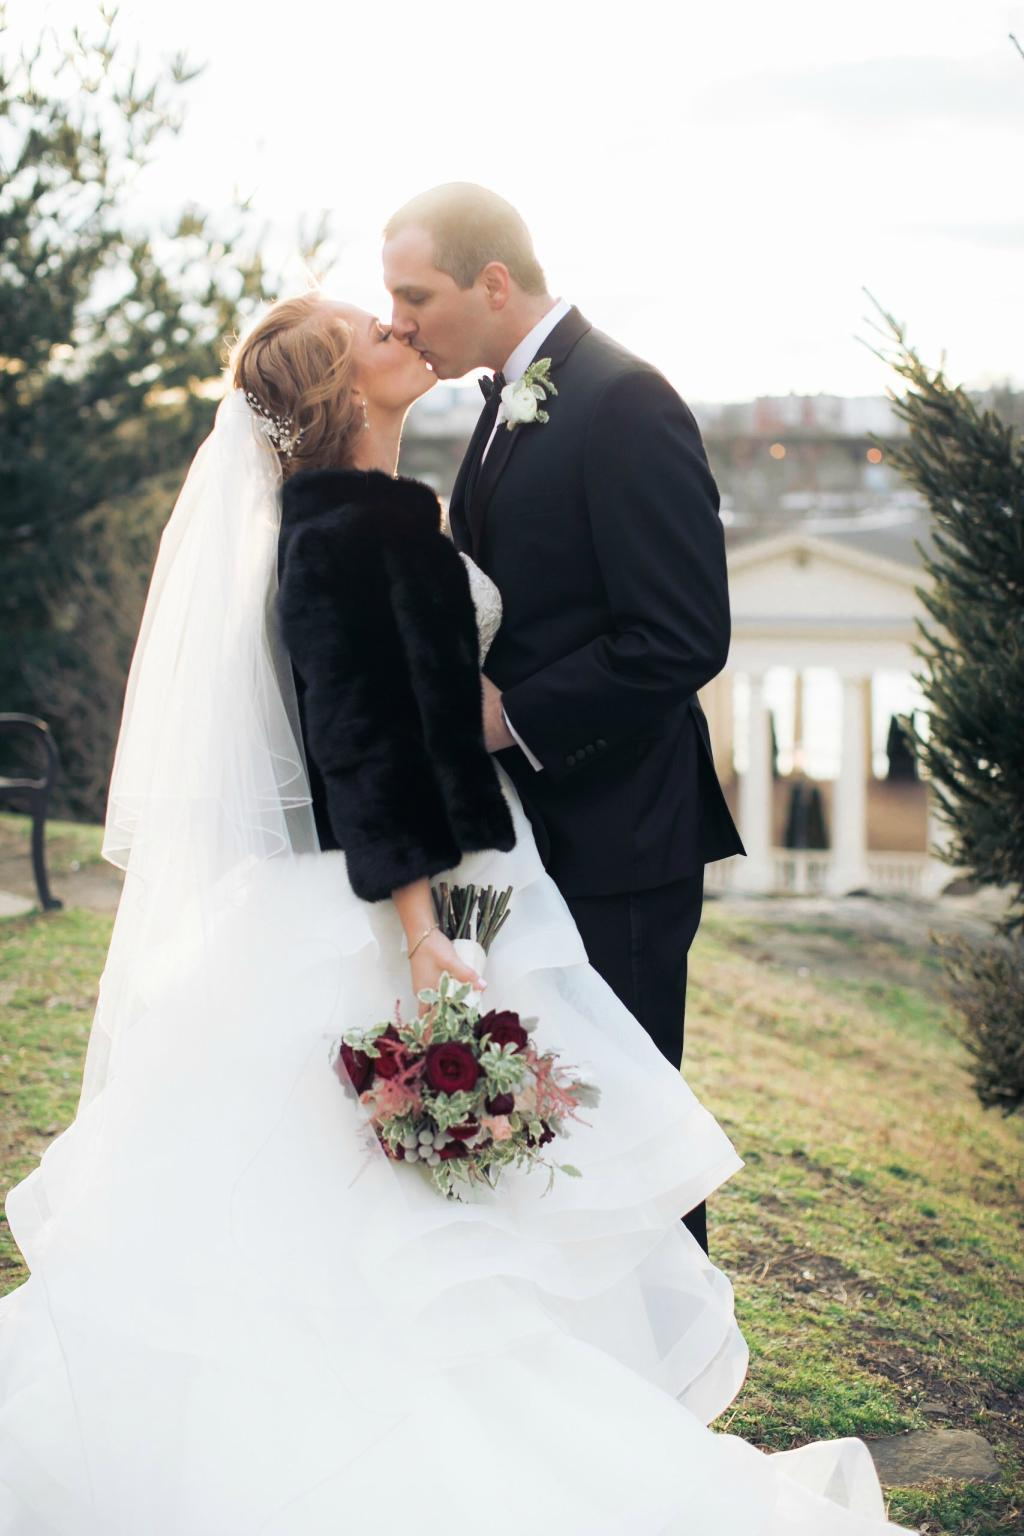 Classic Winter Wedding at Crystal Tea Ballroom Finley Catering Magdalena Kernan Studios Philly In Love Philadelphia Weddings Venues Vendors